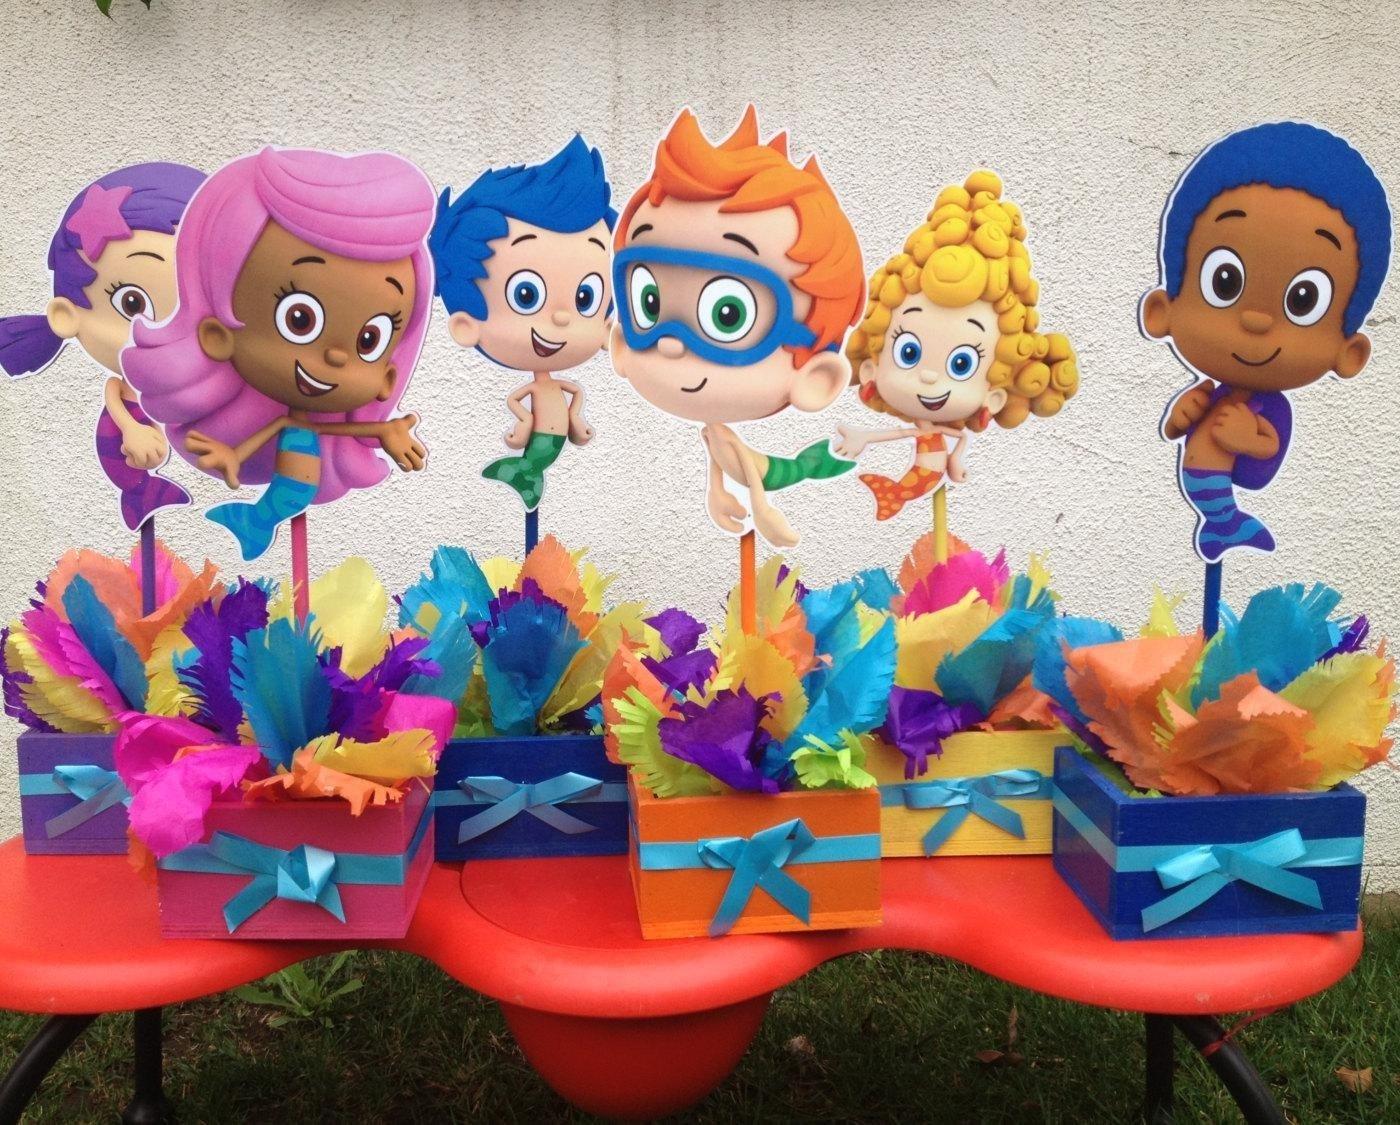 10 Perfect Bubble Guppies Party Favor Ideas bubble guppies bubble guppies party decoration ideas share tweet 2020